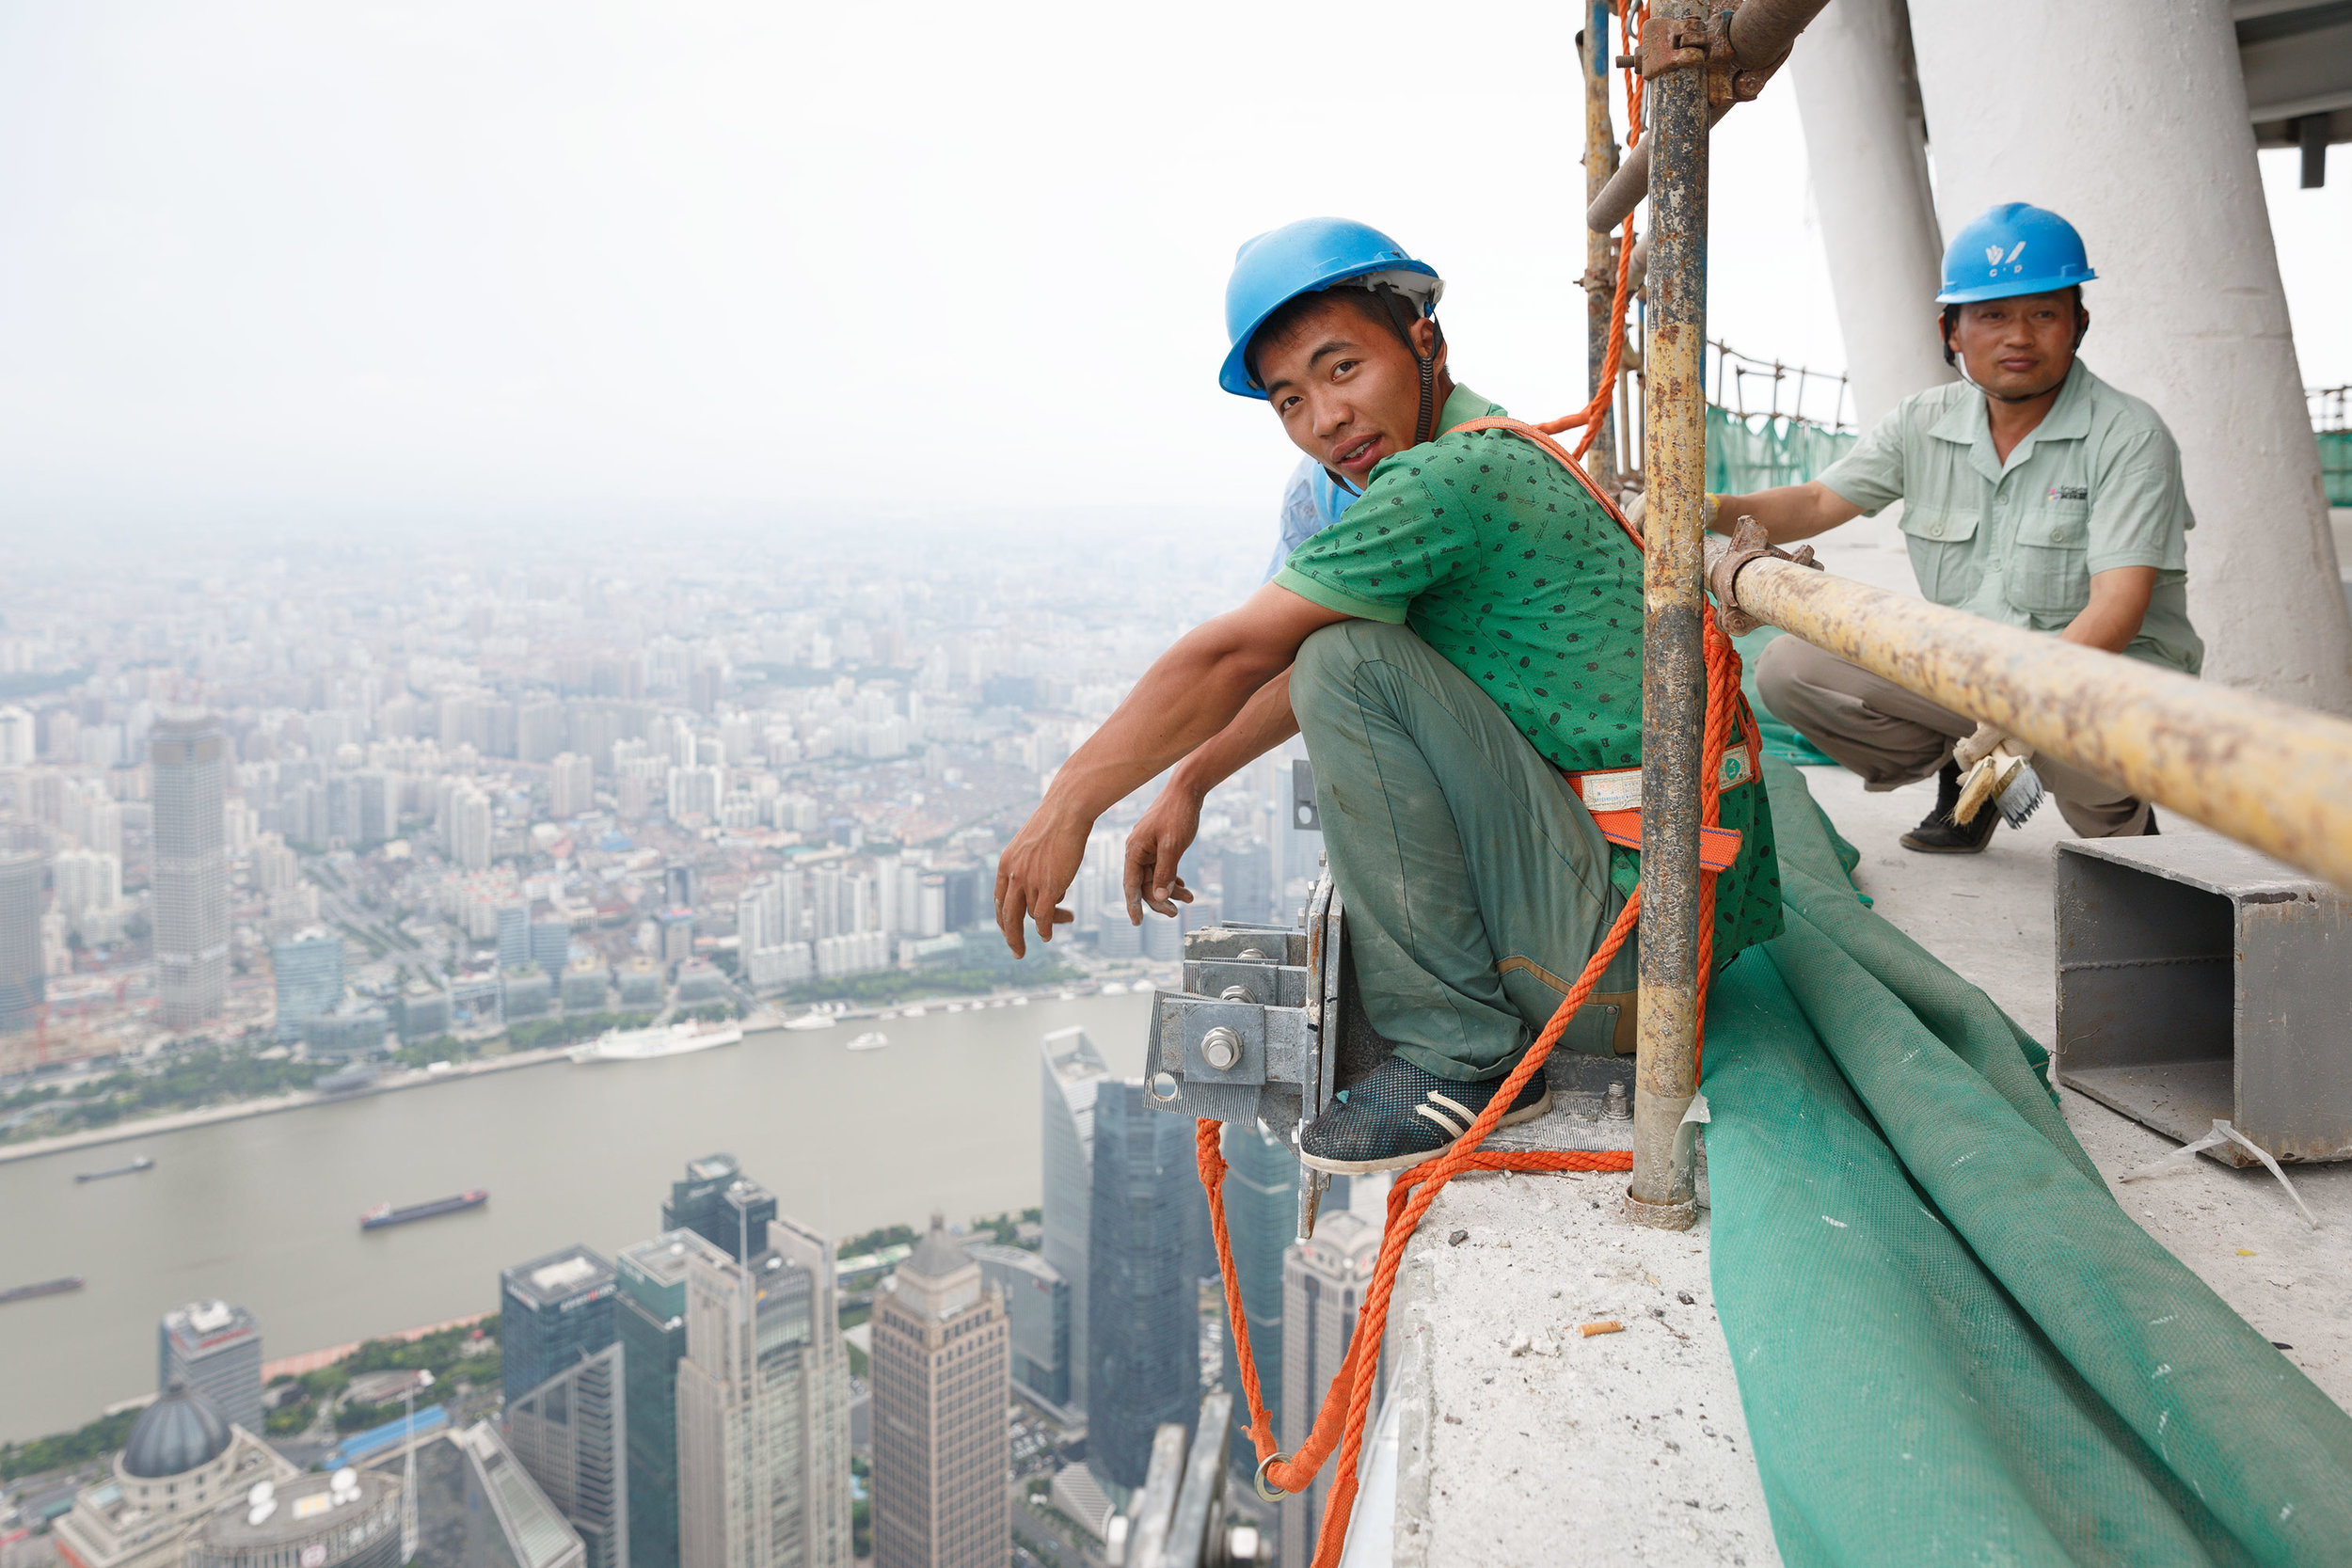 02_20140807_Shanghai_Tower_NS_03839.jpg